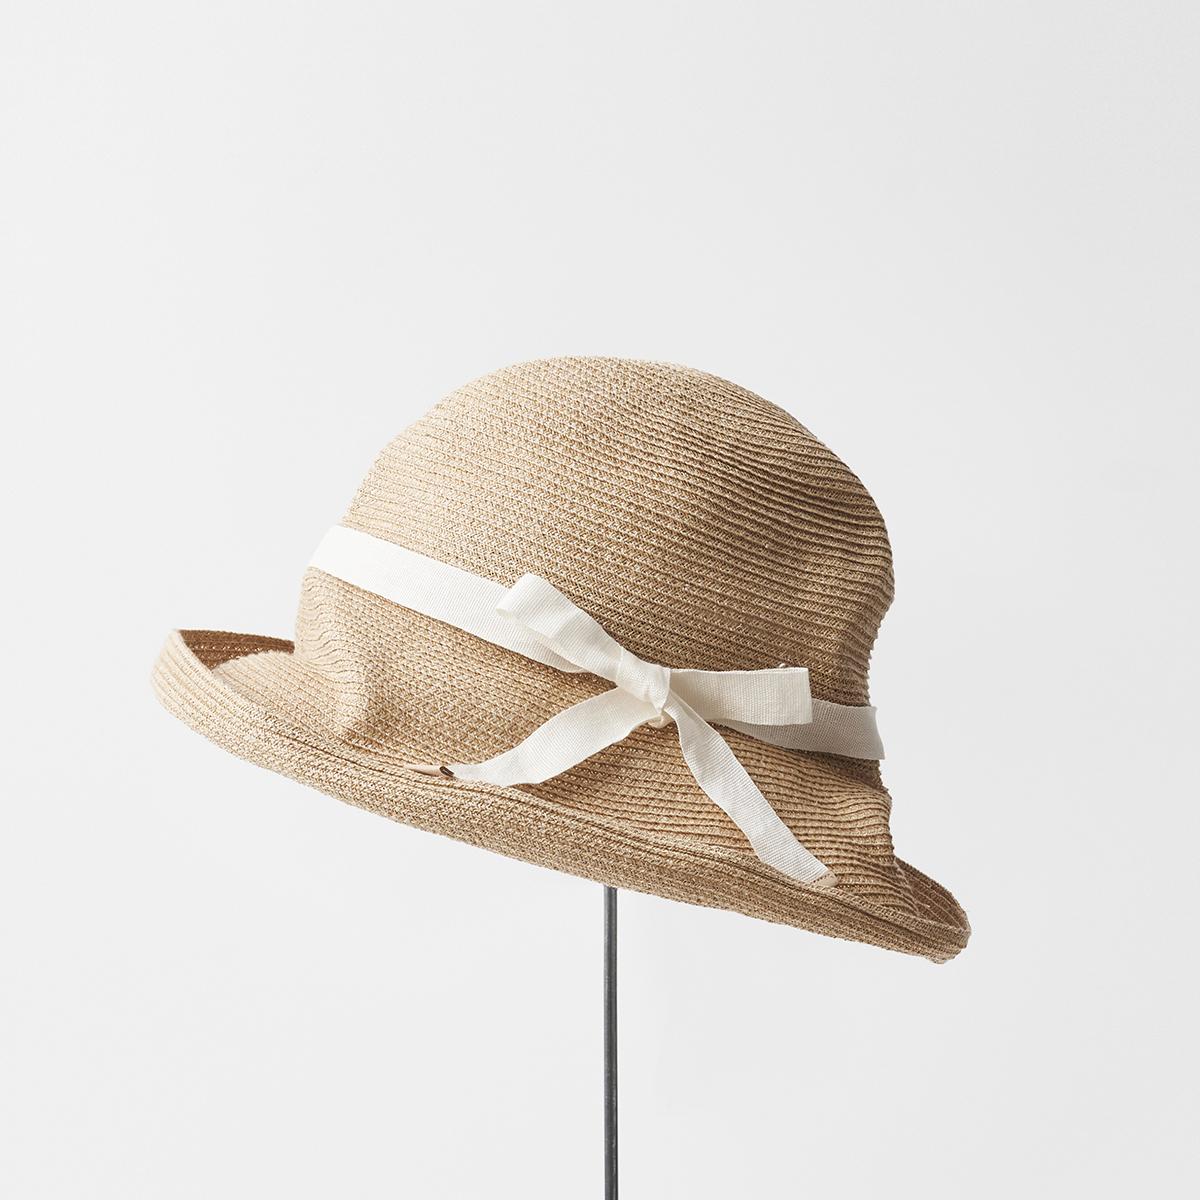 BOXED HAT paperabaca 11cm brim